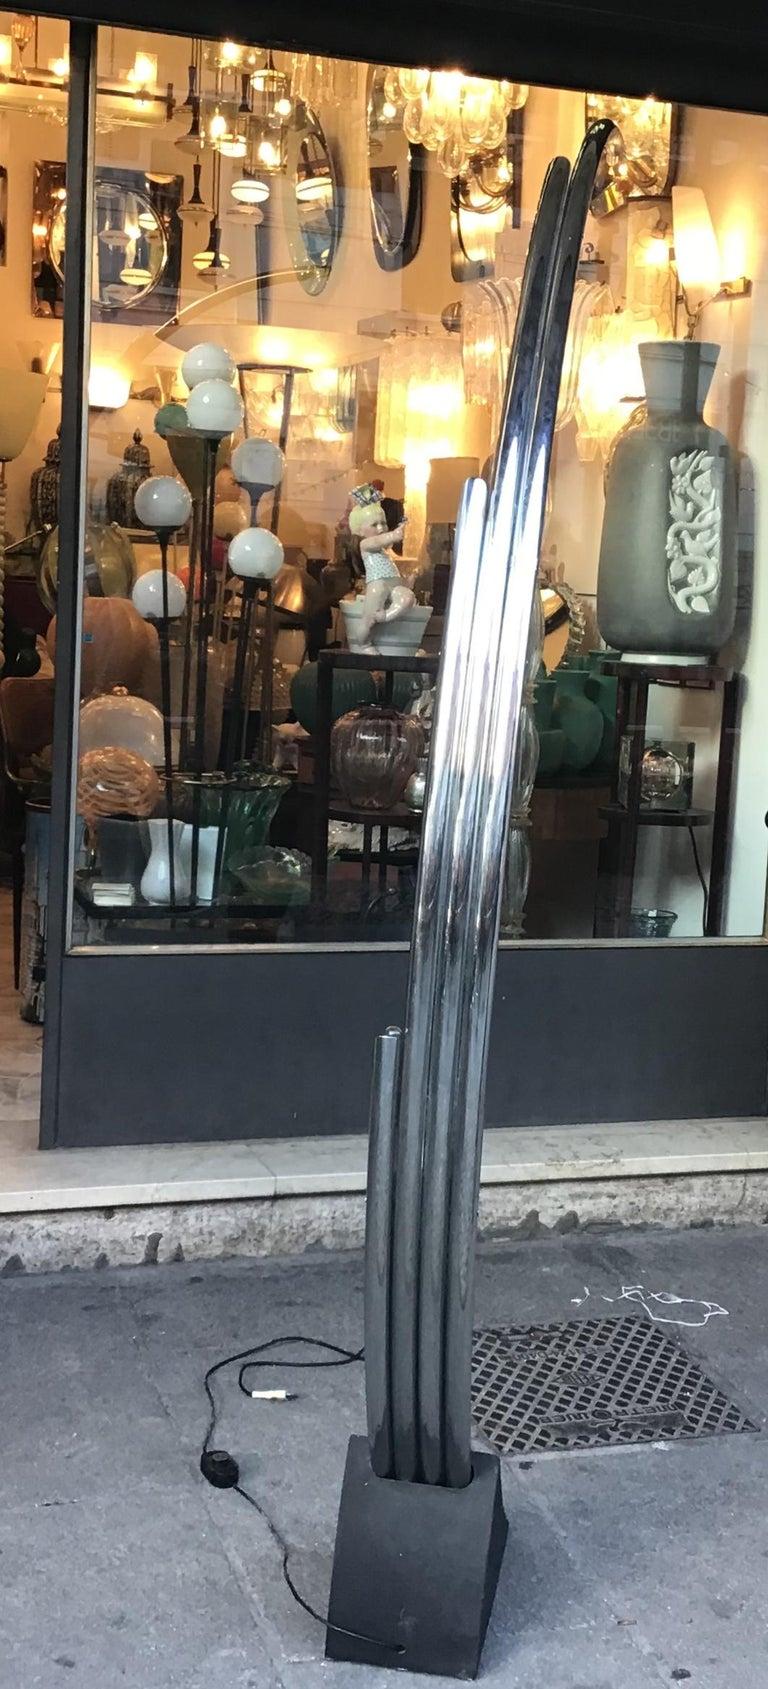 Reggiani Floor Lamp Four Lights Chrome and Cast Iron, Italian, 1970 For Sale 3